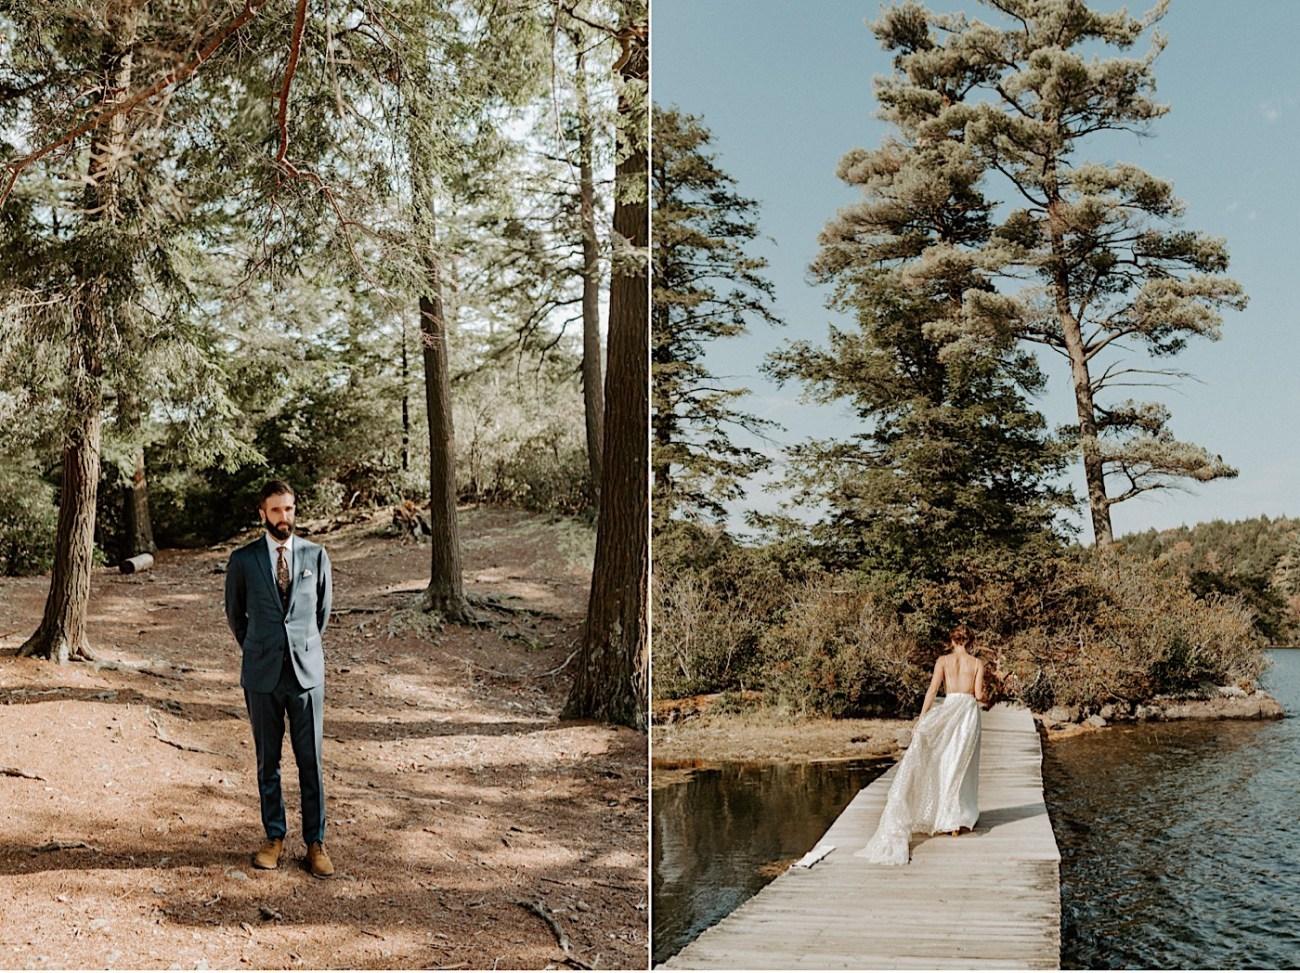 Destination Lakeside Wedding Mt Washington Wedding Outdoor Wedding Boston Wedding Photographer 024